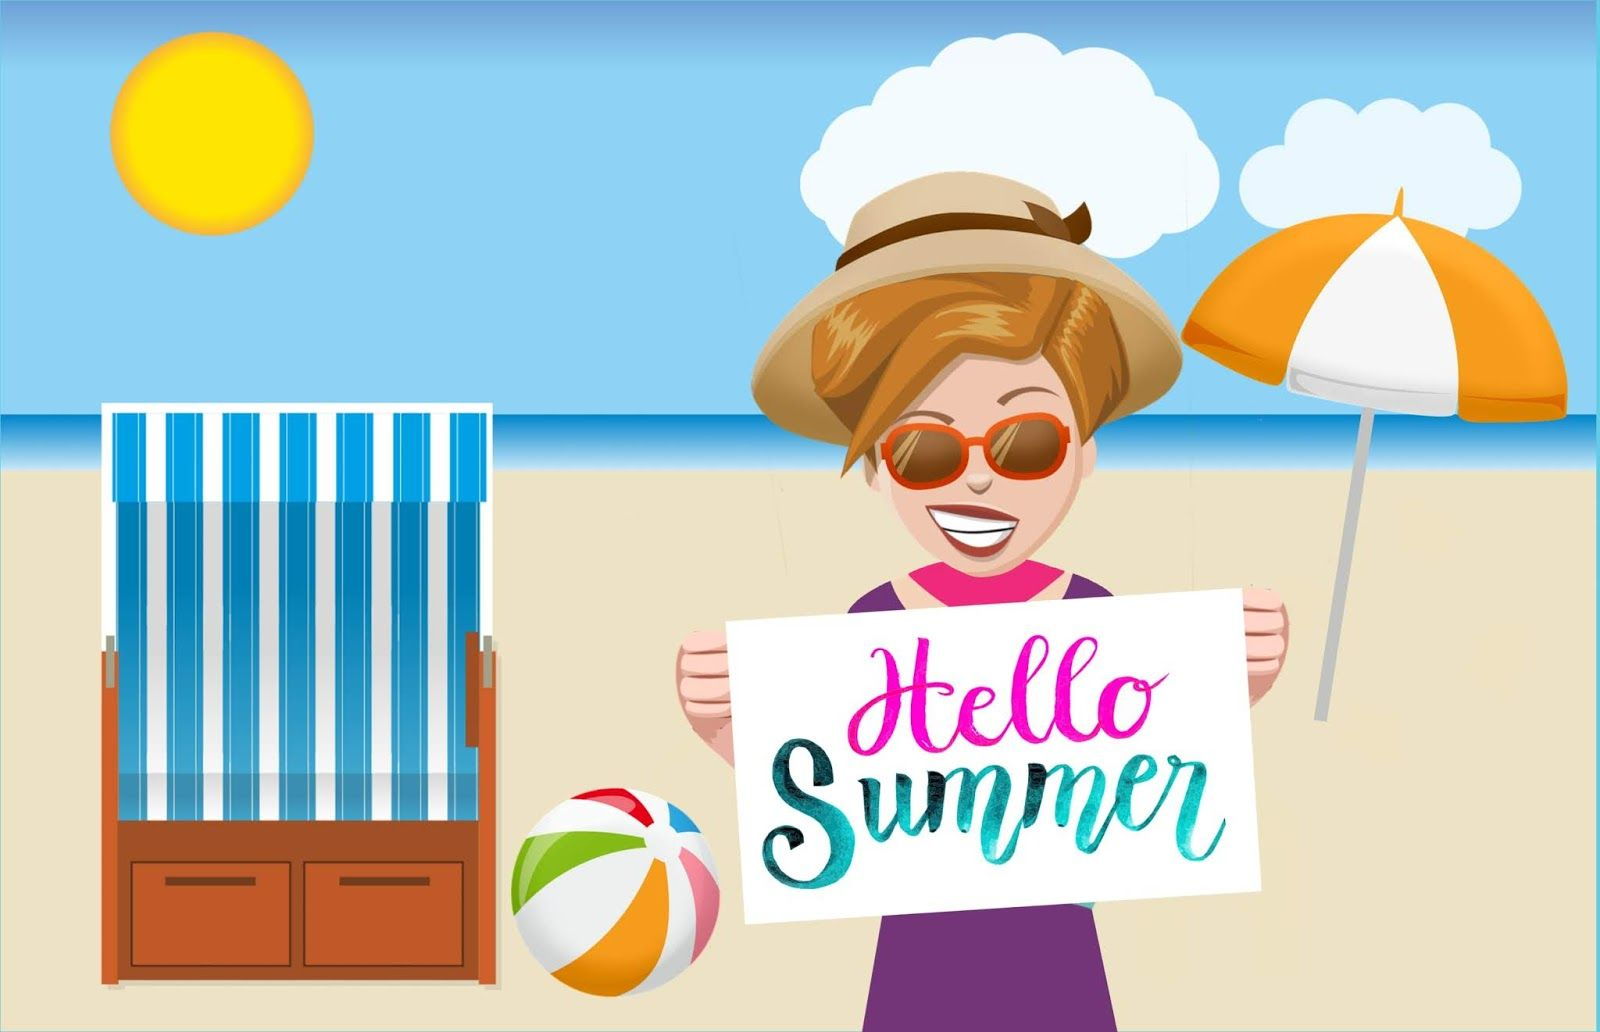 9224bf959f7b Download free illustrations of hello summer